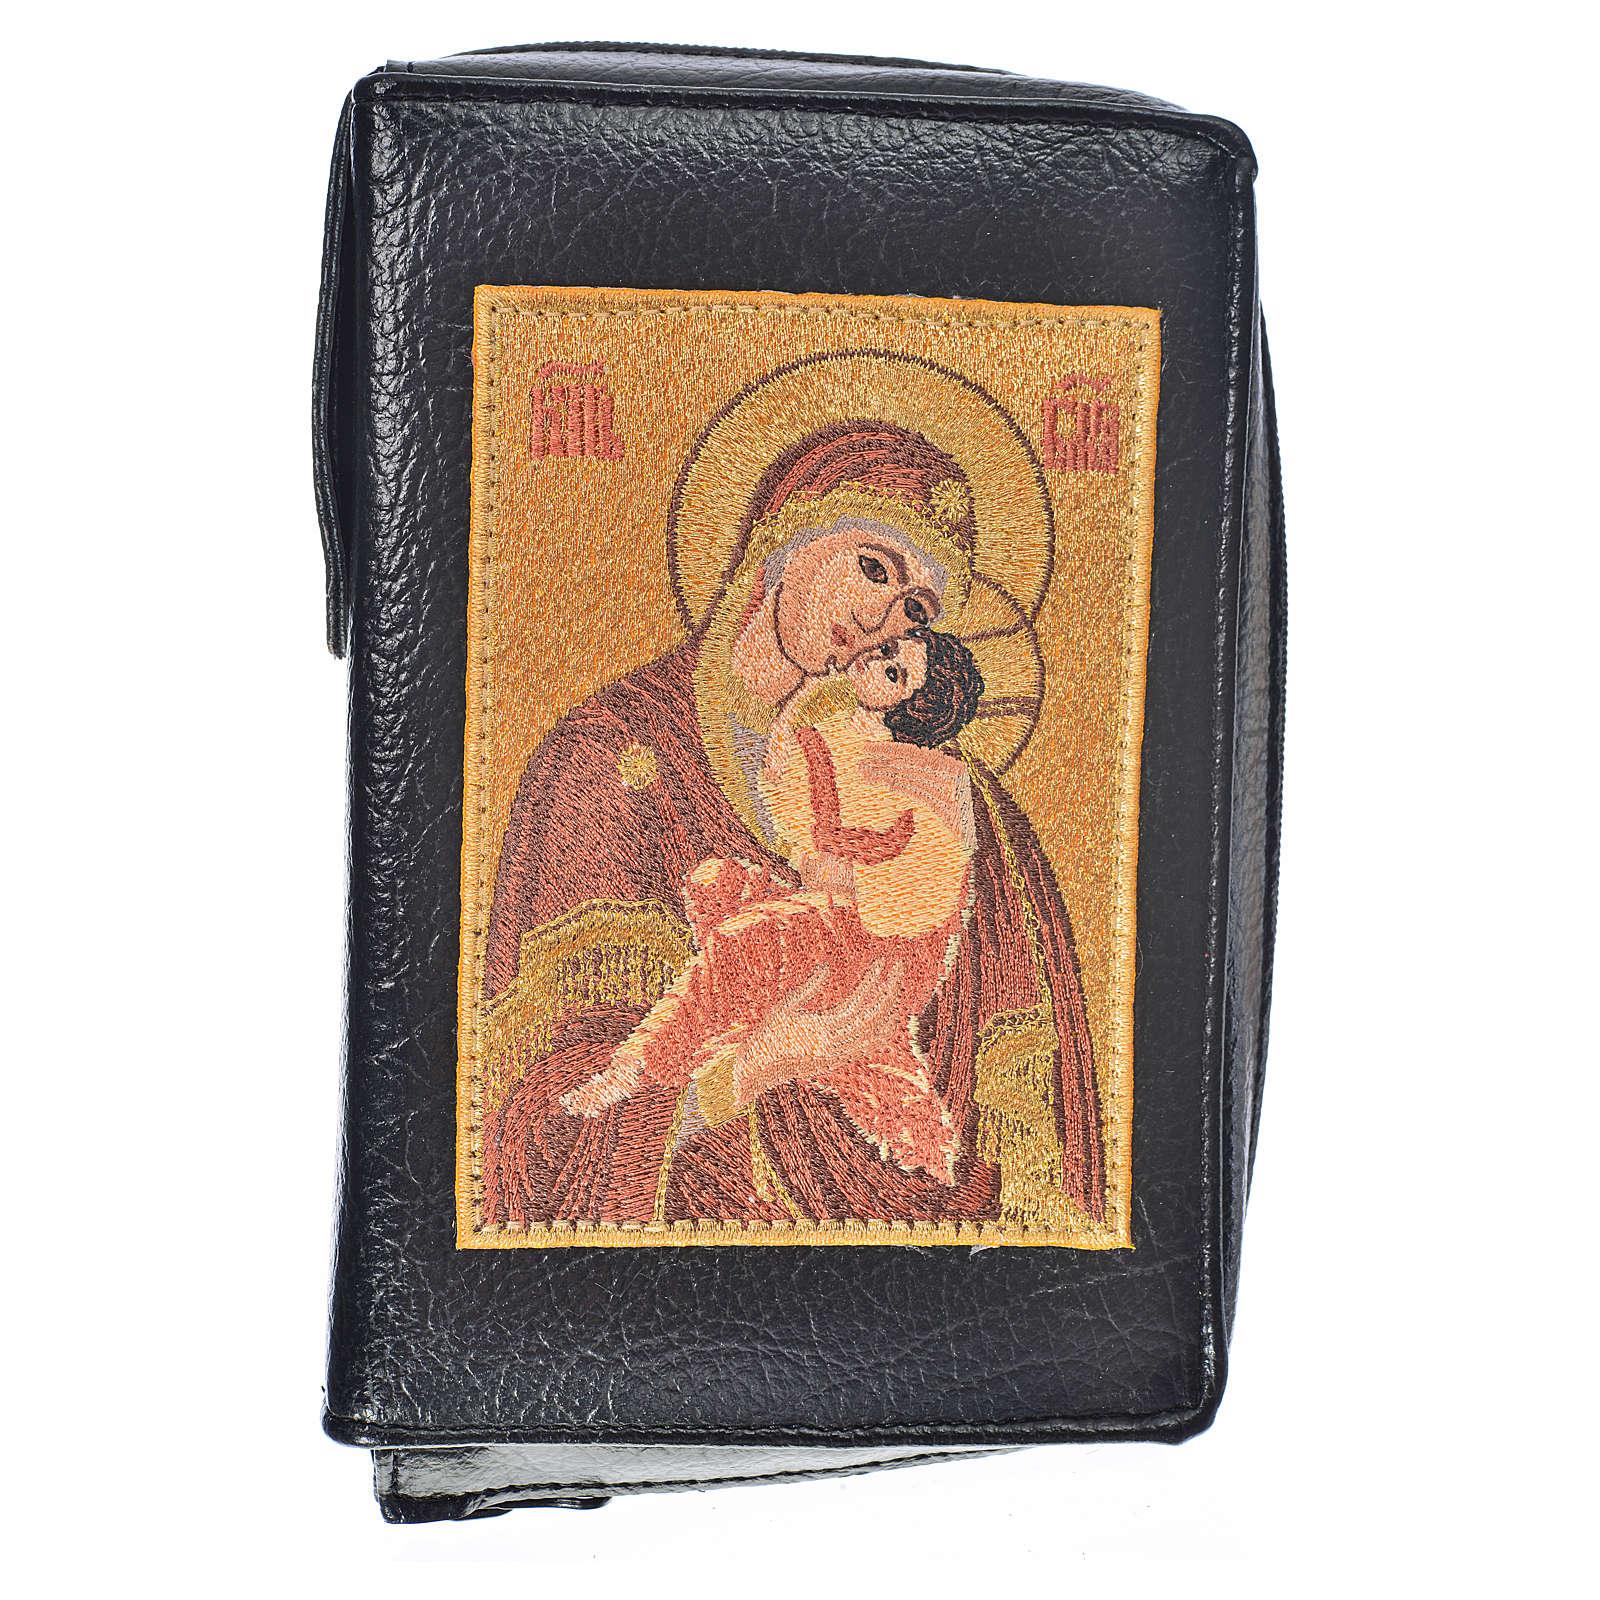 Funda Sagrada Biblia CEE ED. Pop. simil cuero negro Virgen Tern 4